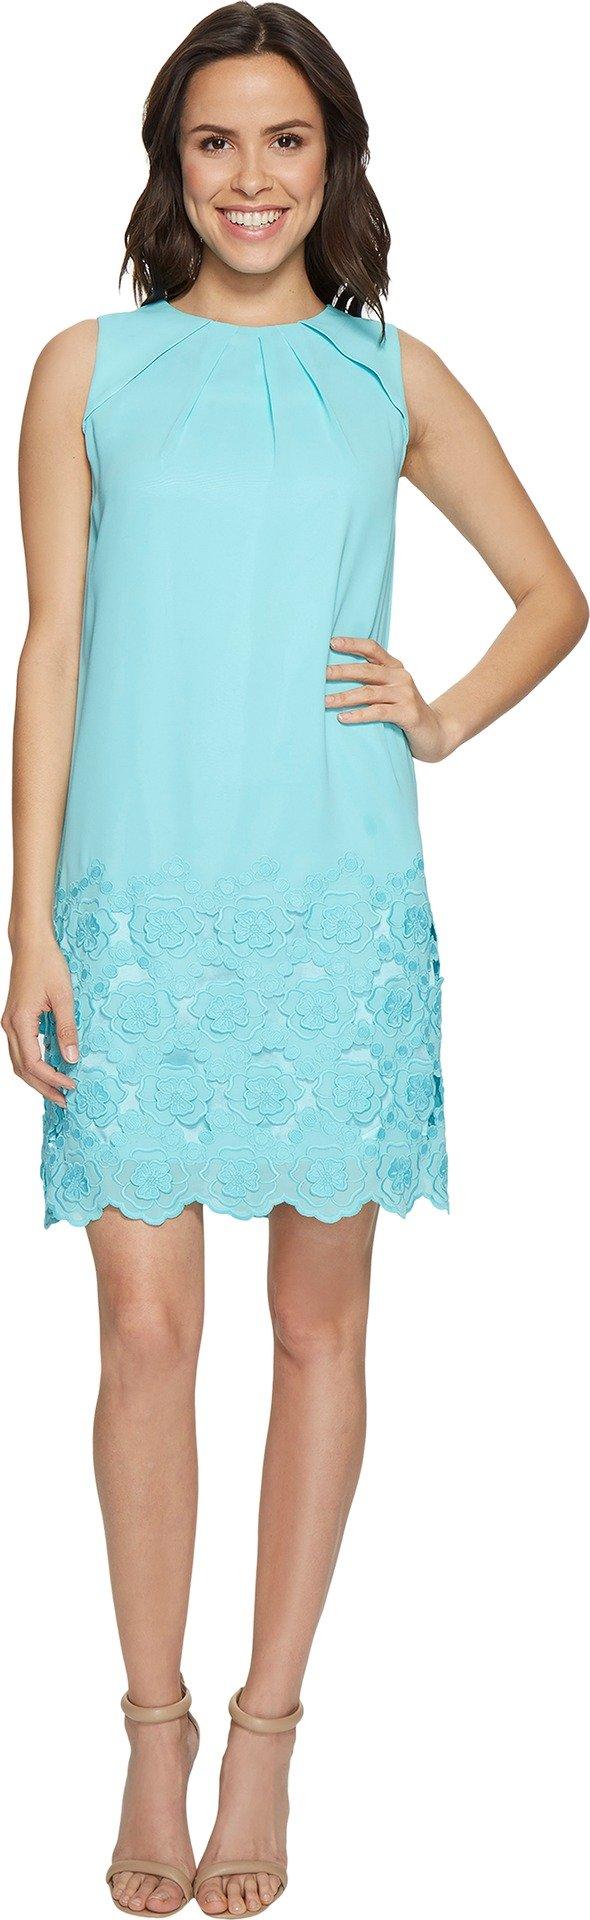 Tahari by ASL Women's Floral Embroidered Hem Shift Dress Beach Glass Blue Dress